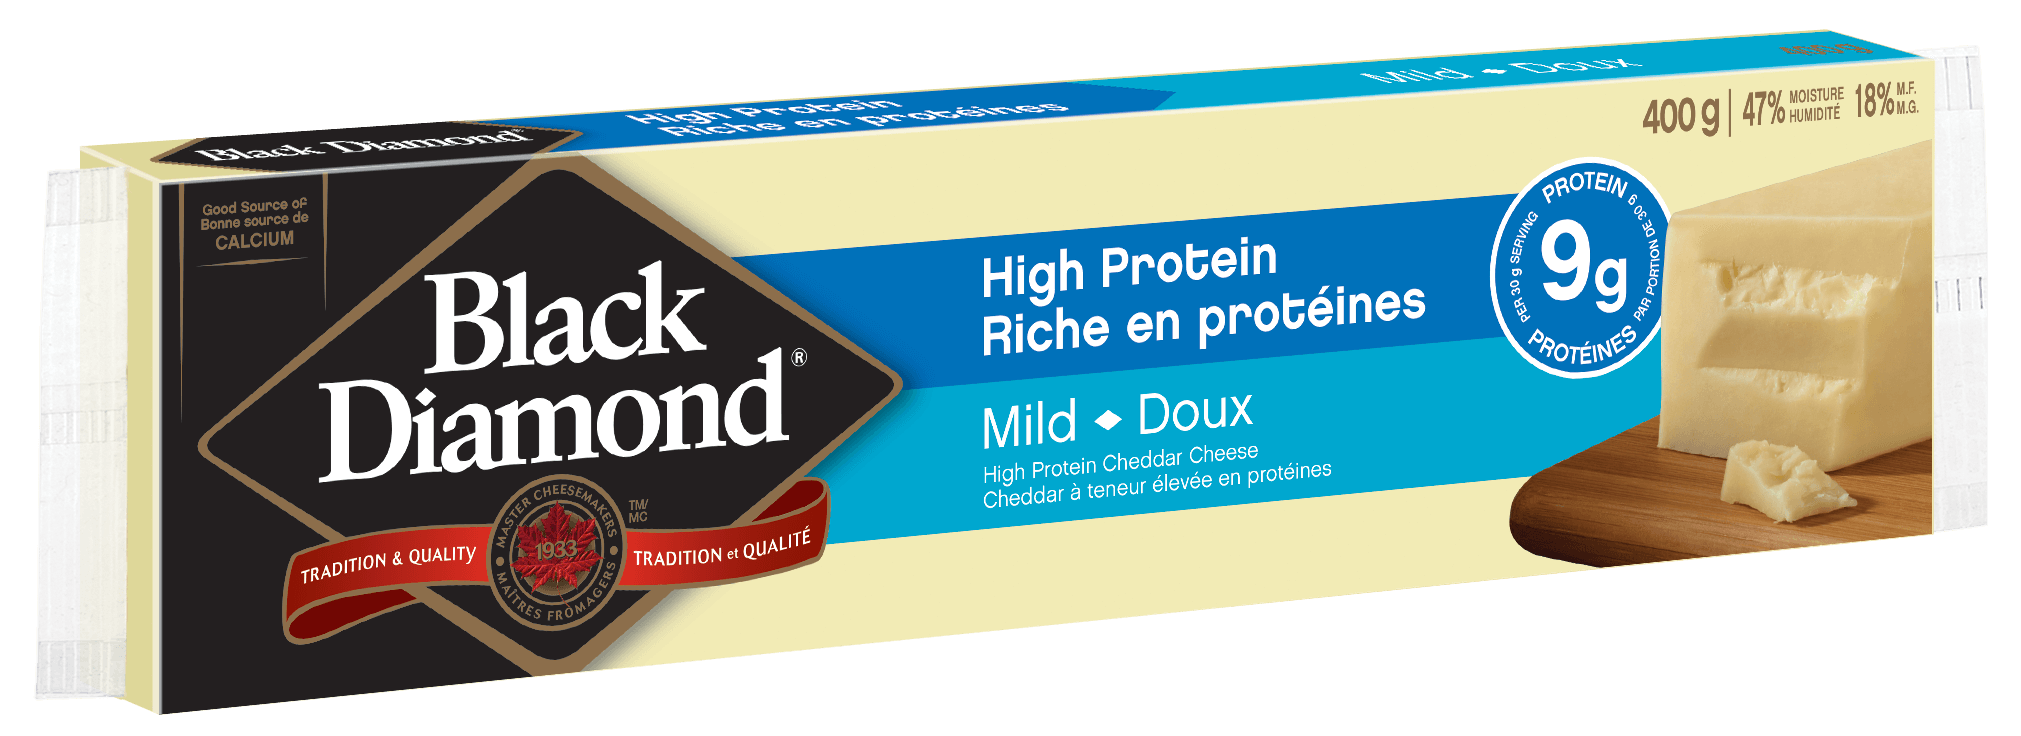 Cheddar doux riche en protéins 400 g